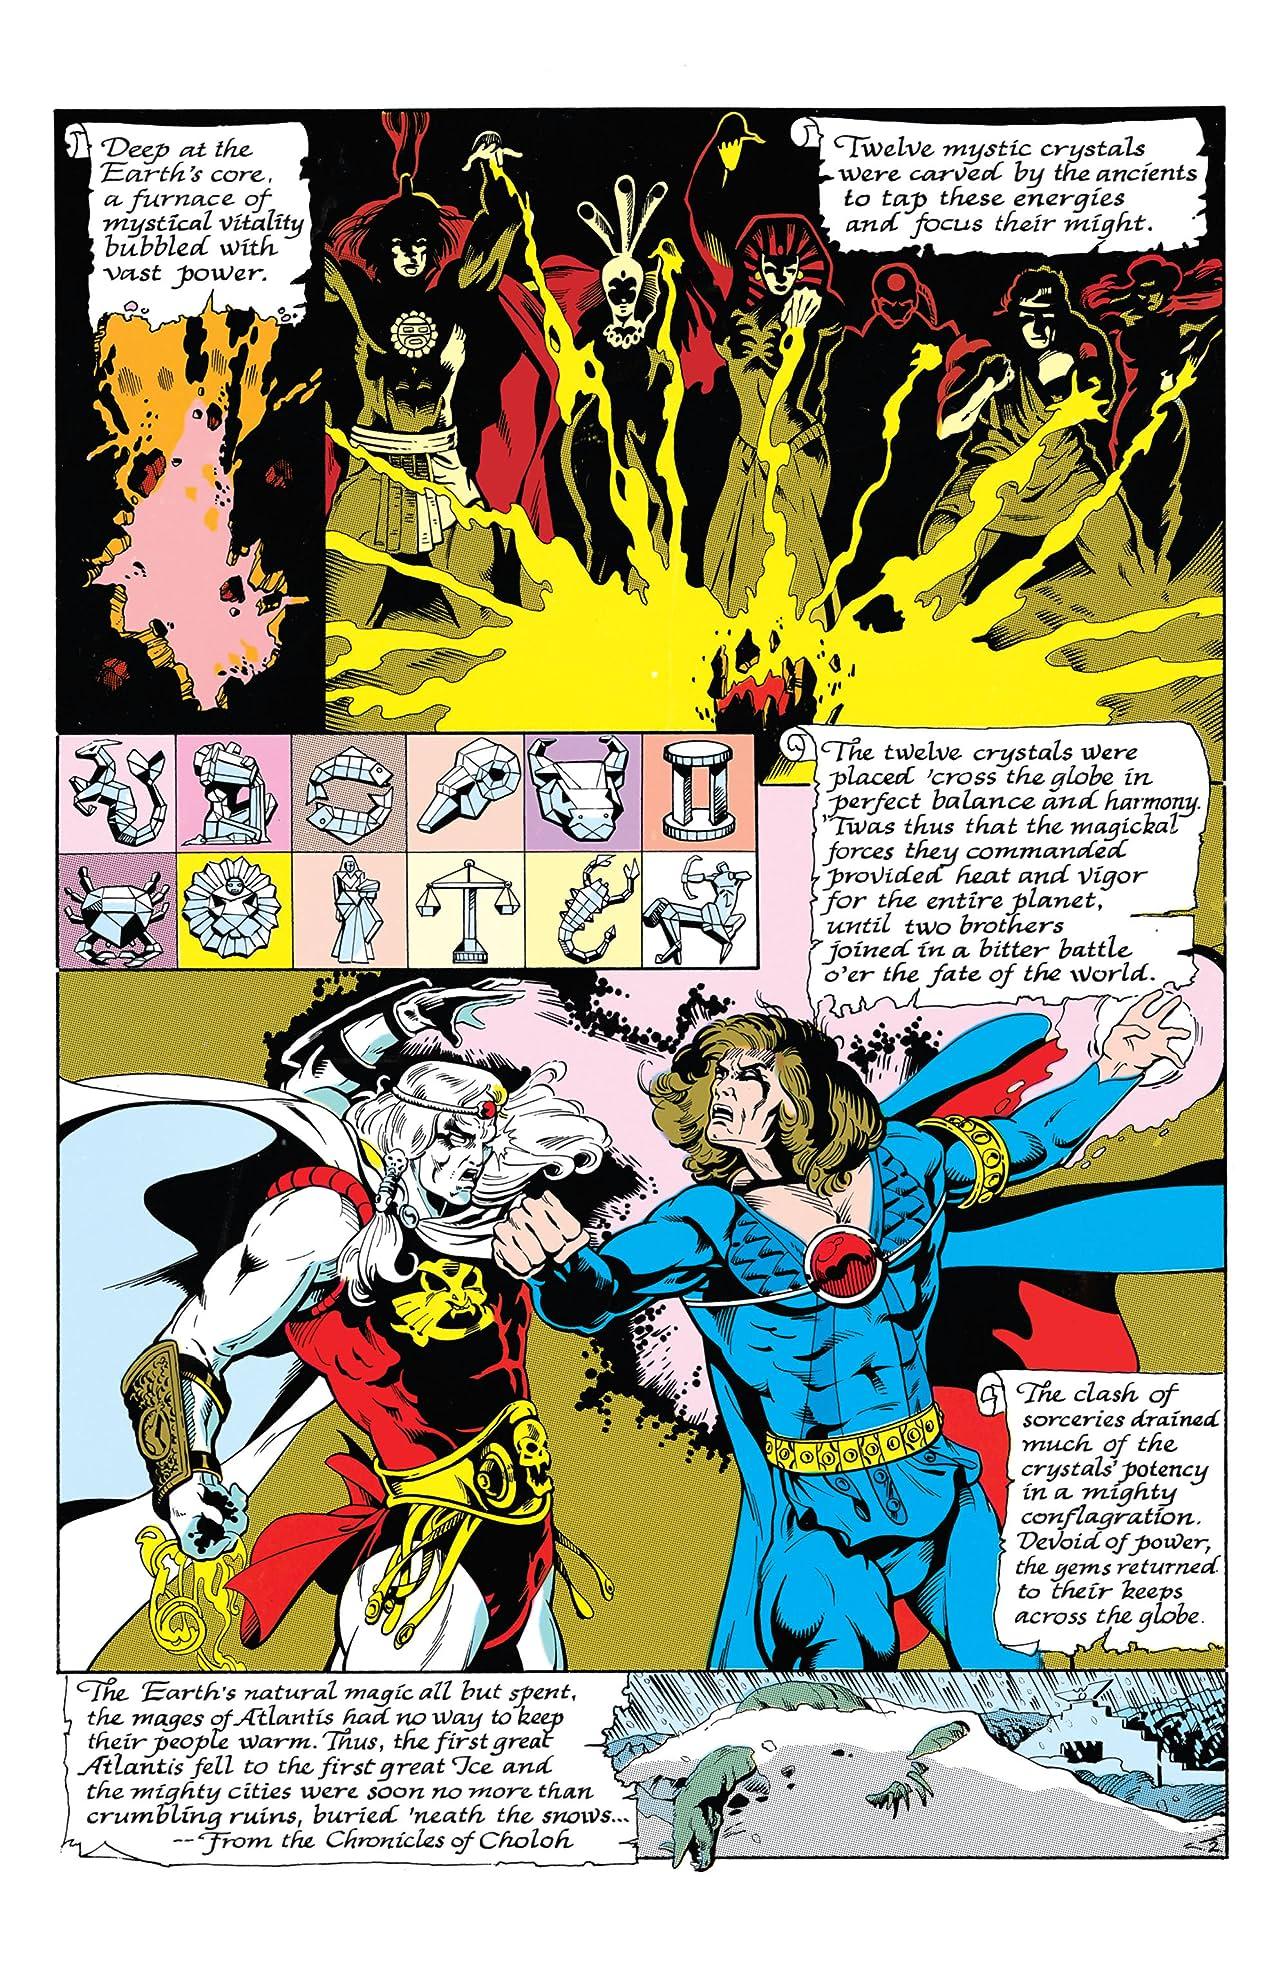 Aquaman (1986) #1 (of 4)